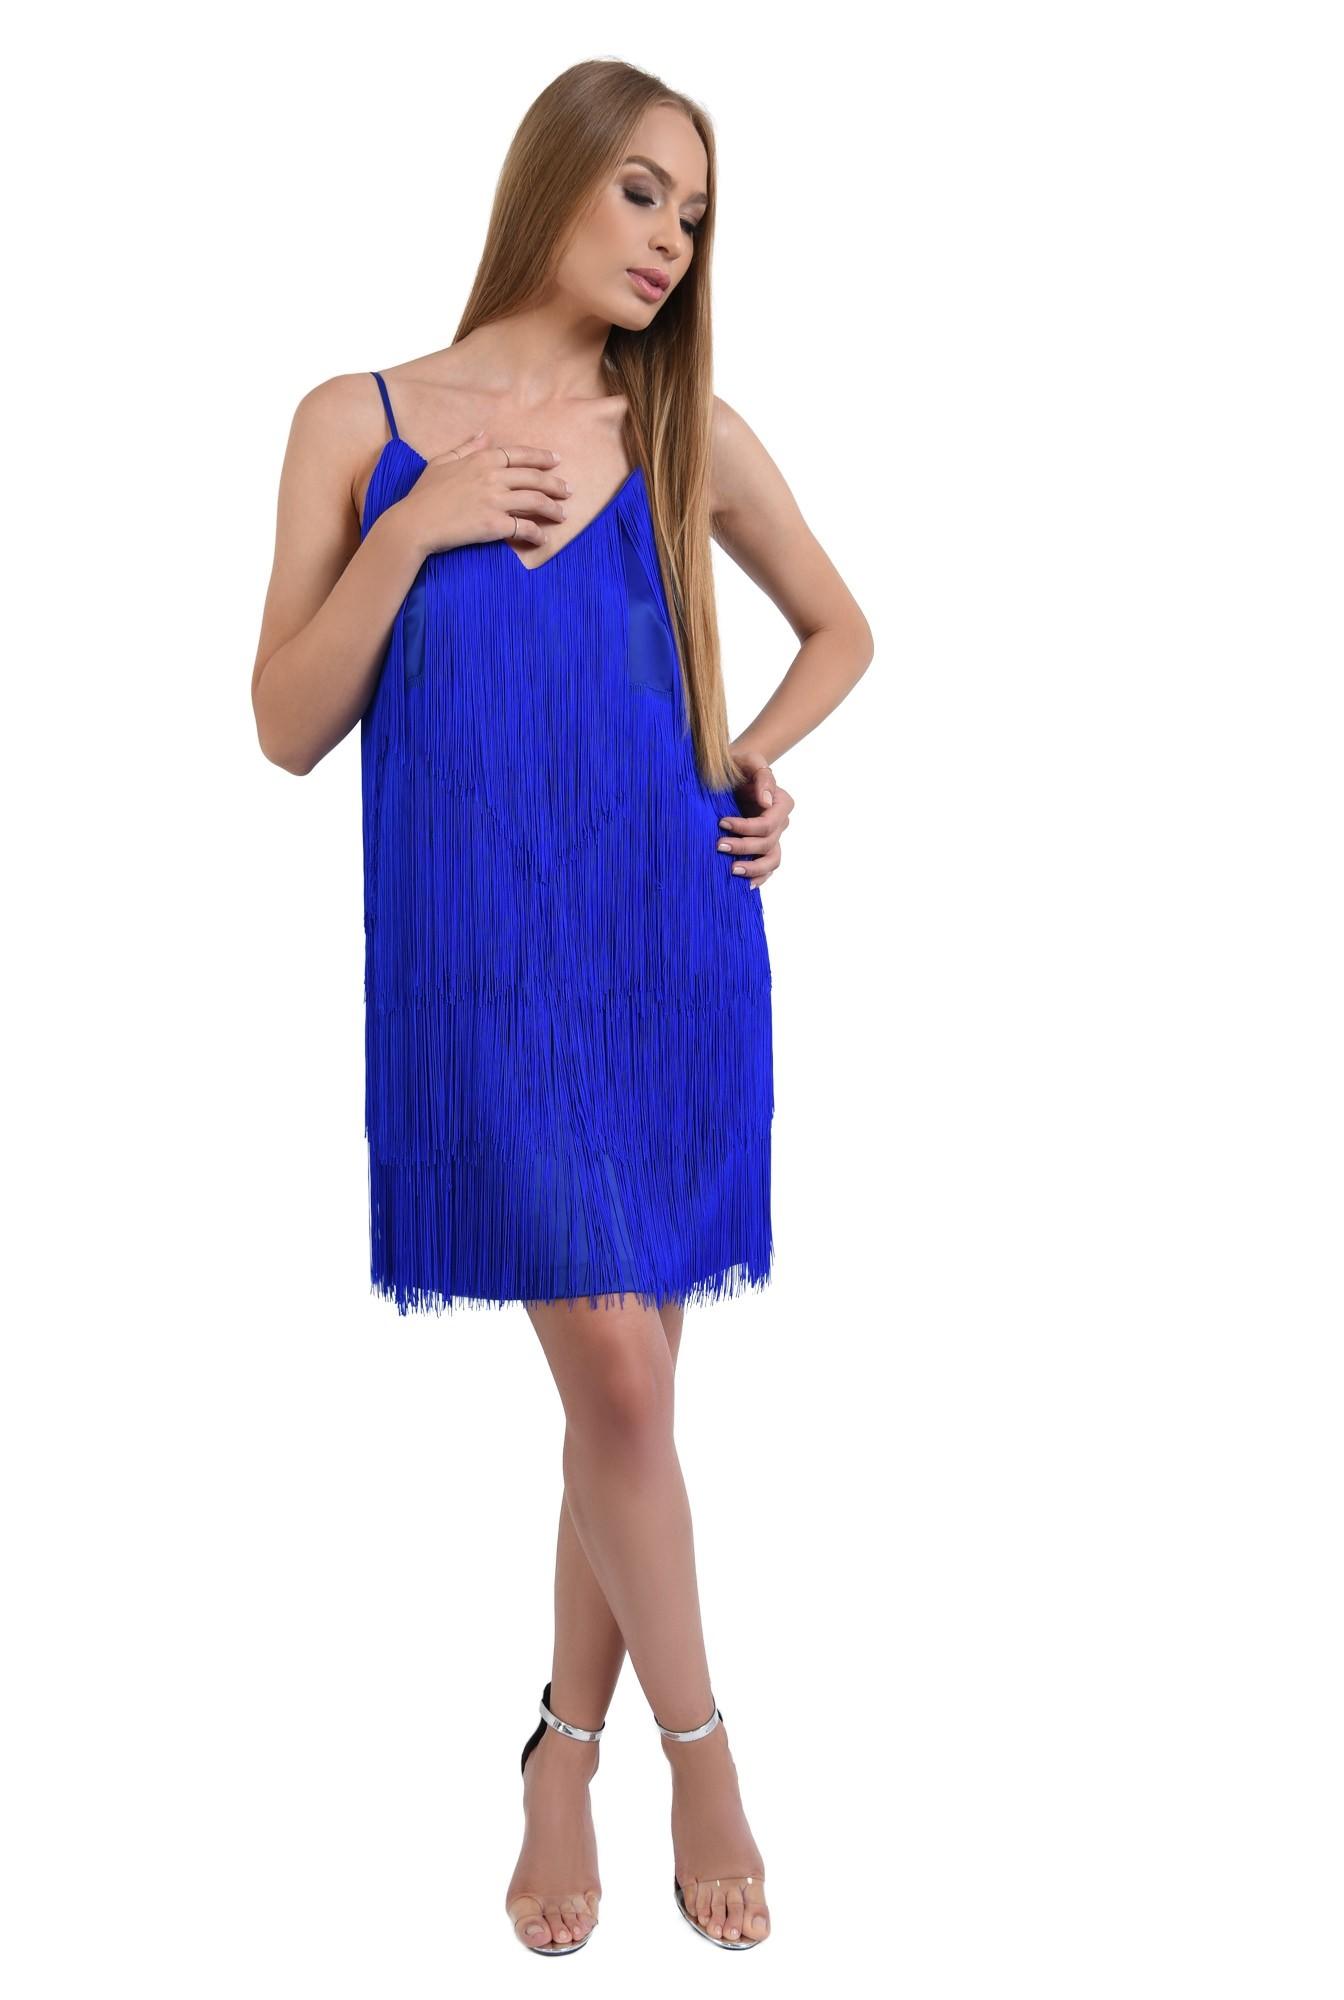 360 - rochie de seara albastra, cu frajuri, slip on, croi drept, anchior